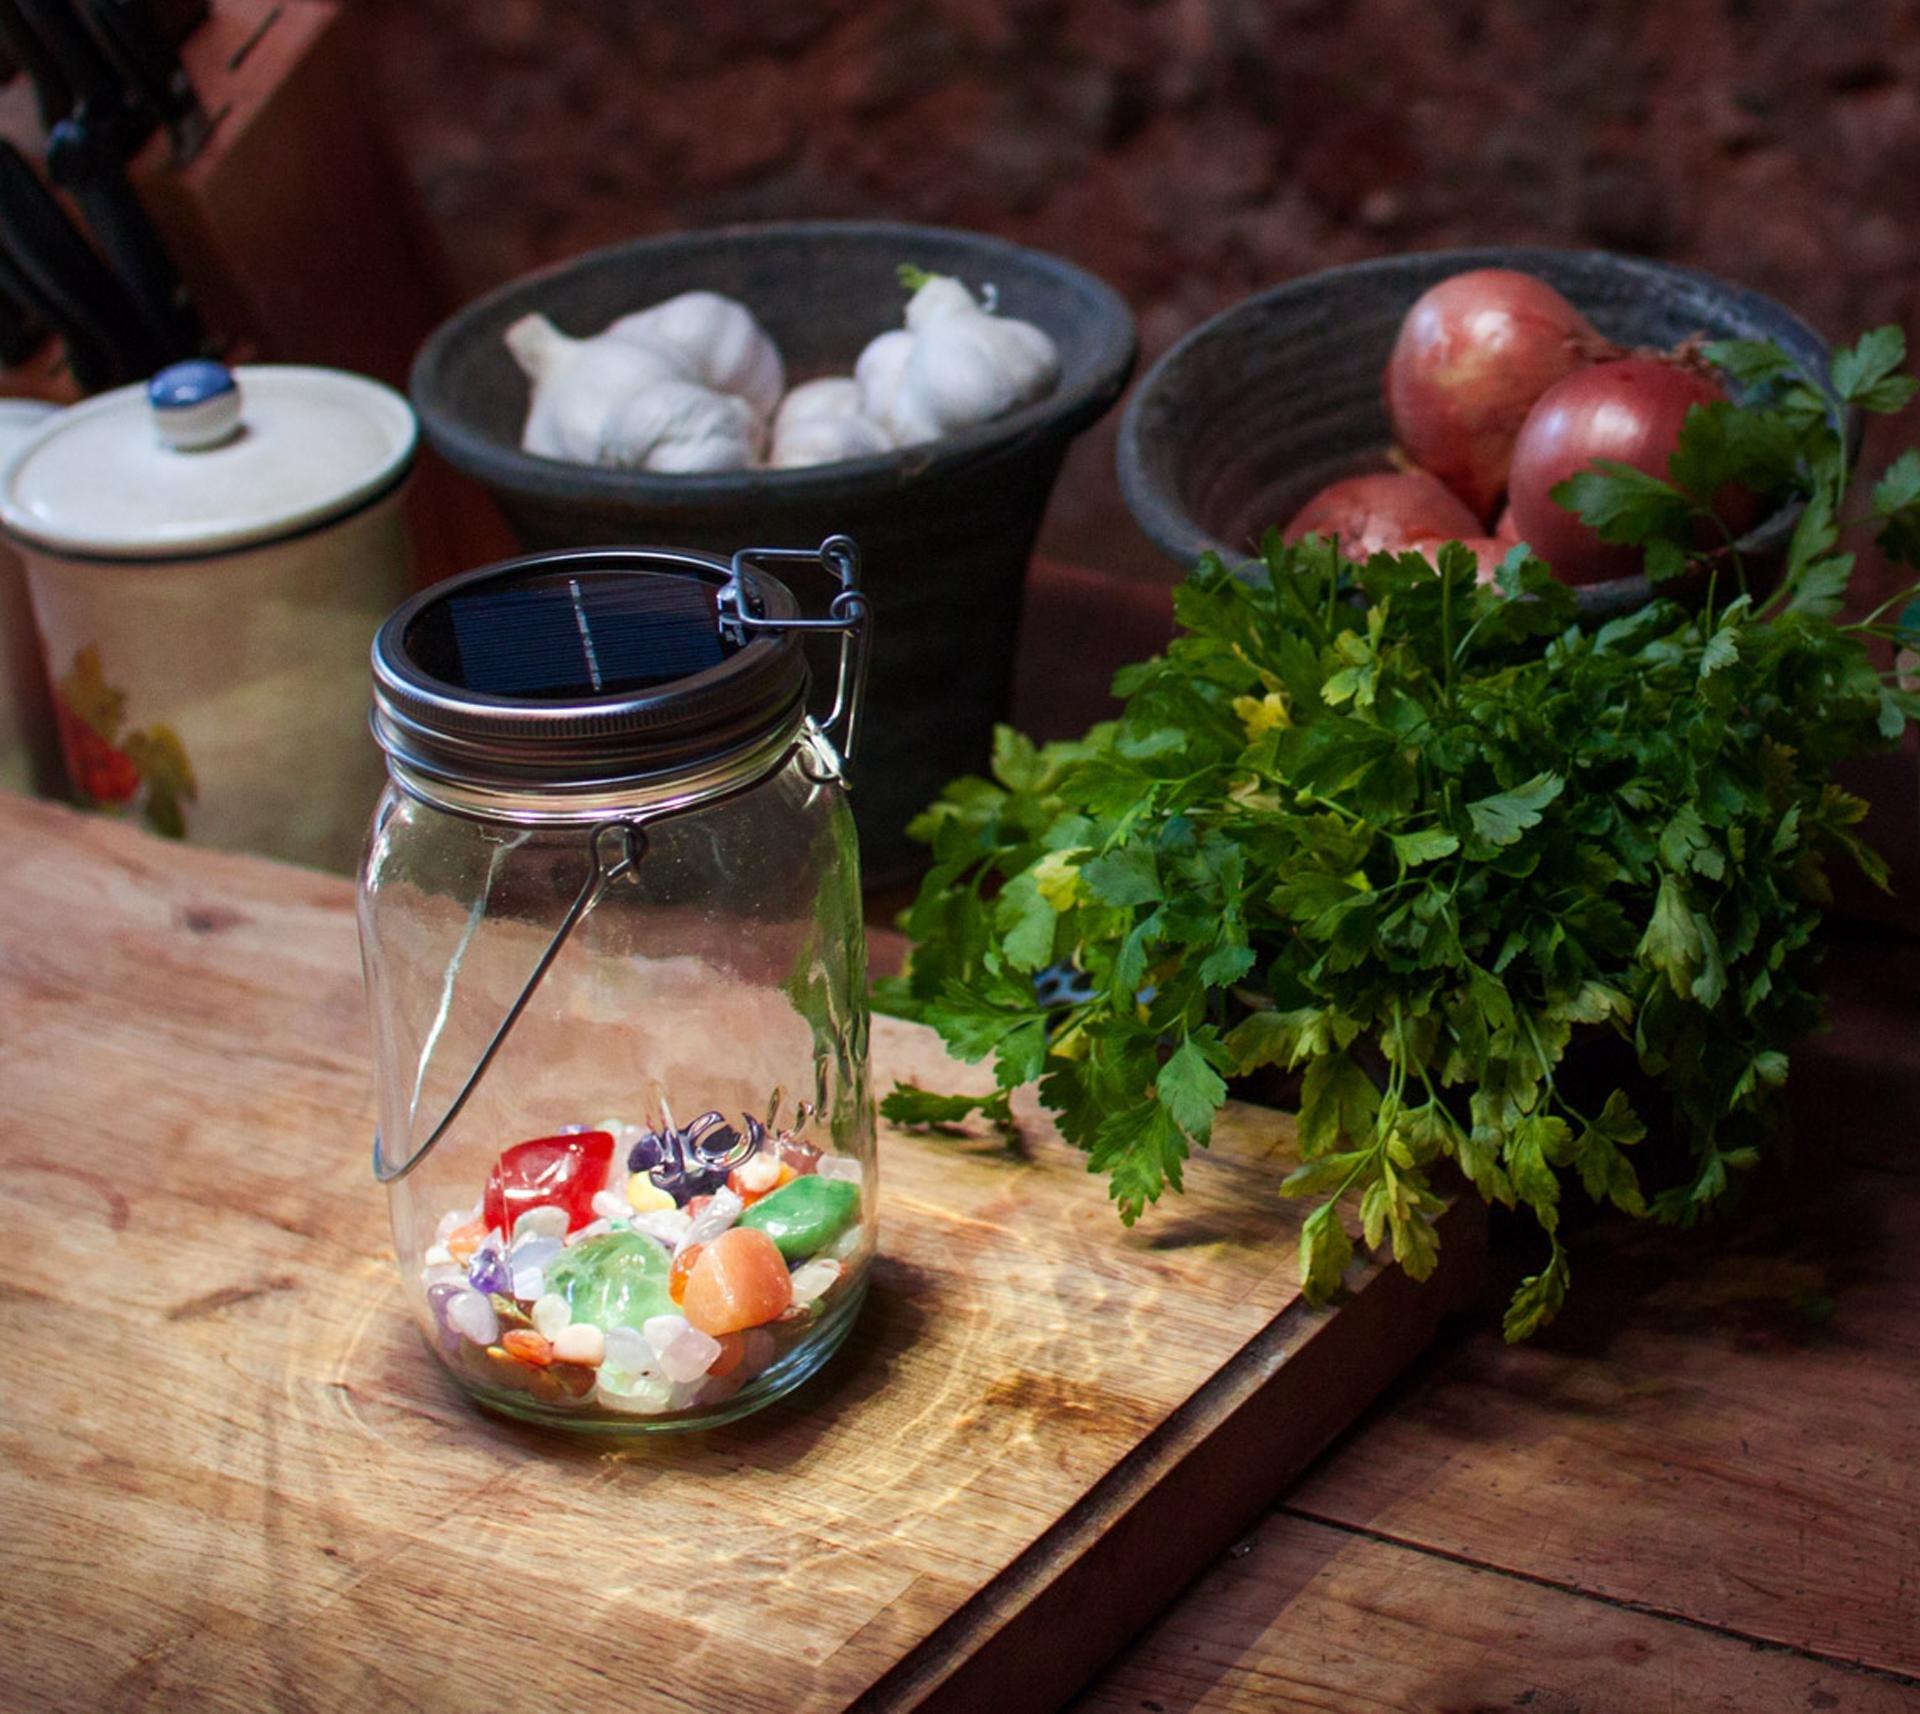 Sonnenglas Solar Jar Solar Powered Led Lantern Table Light With